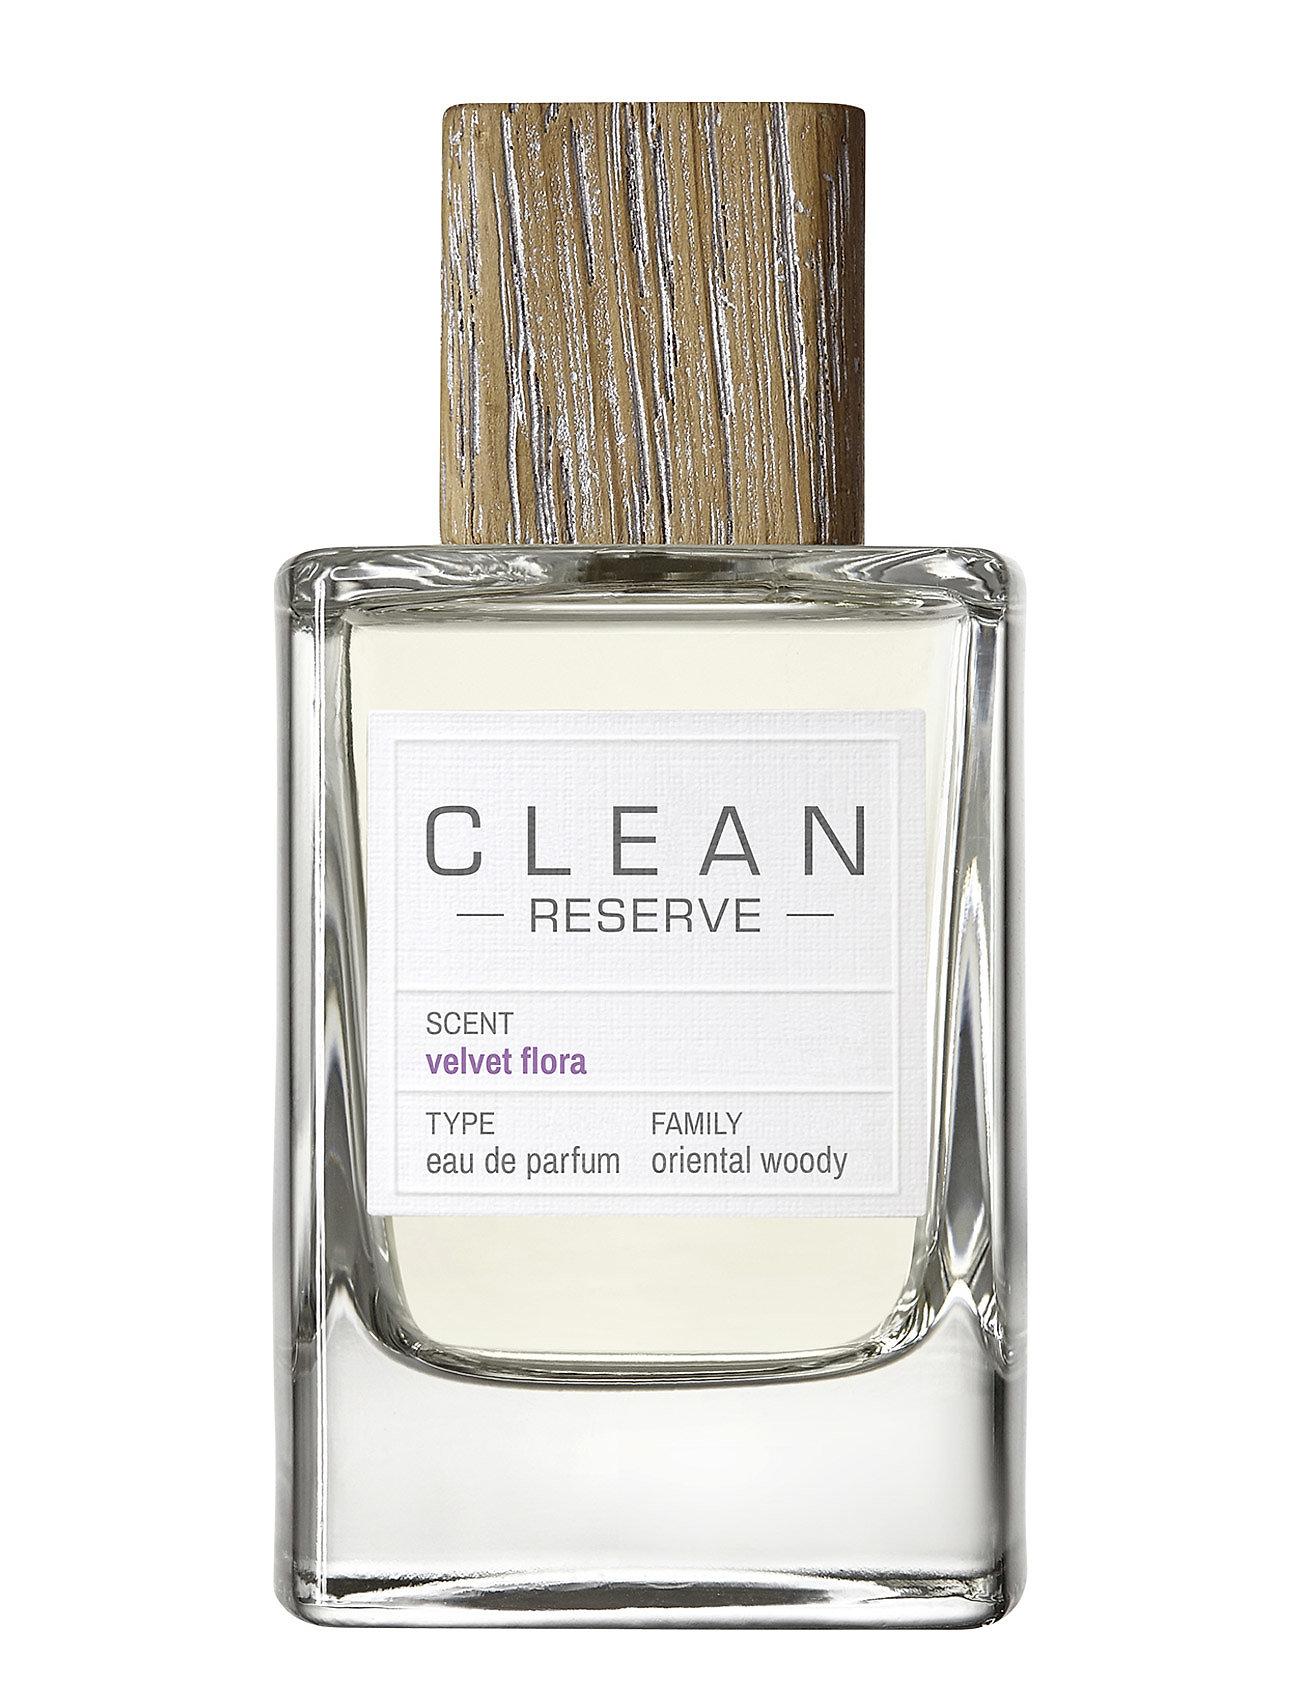 clean reserve – Clean reserve velvet flora fra boozt.com dk